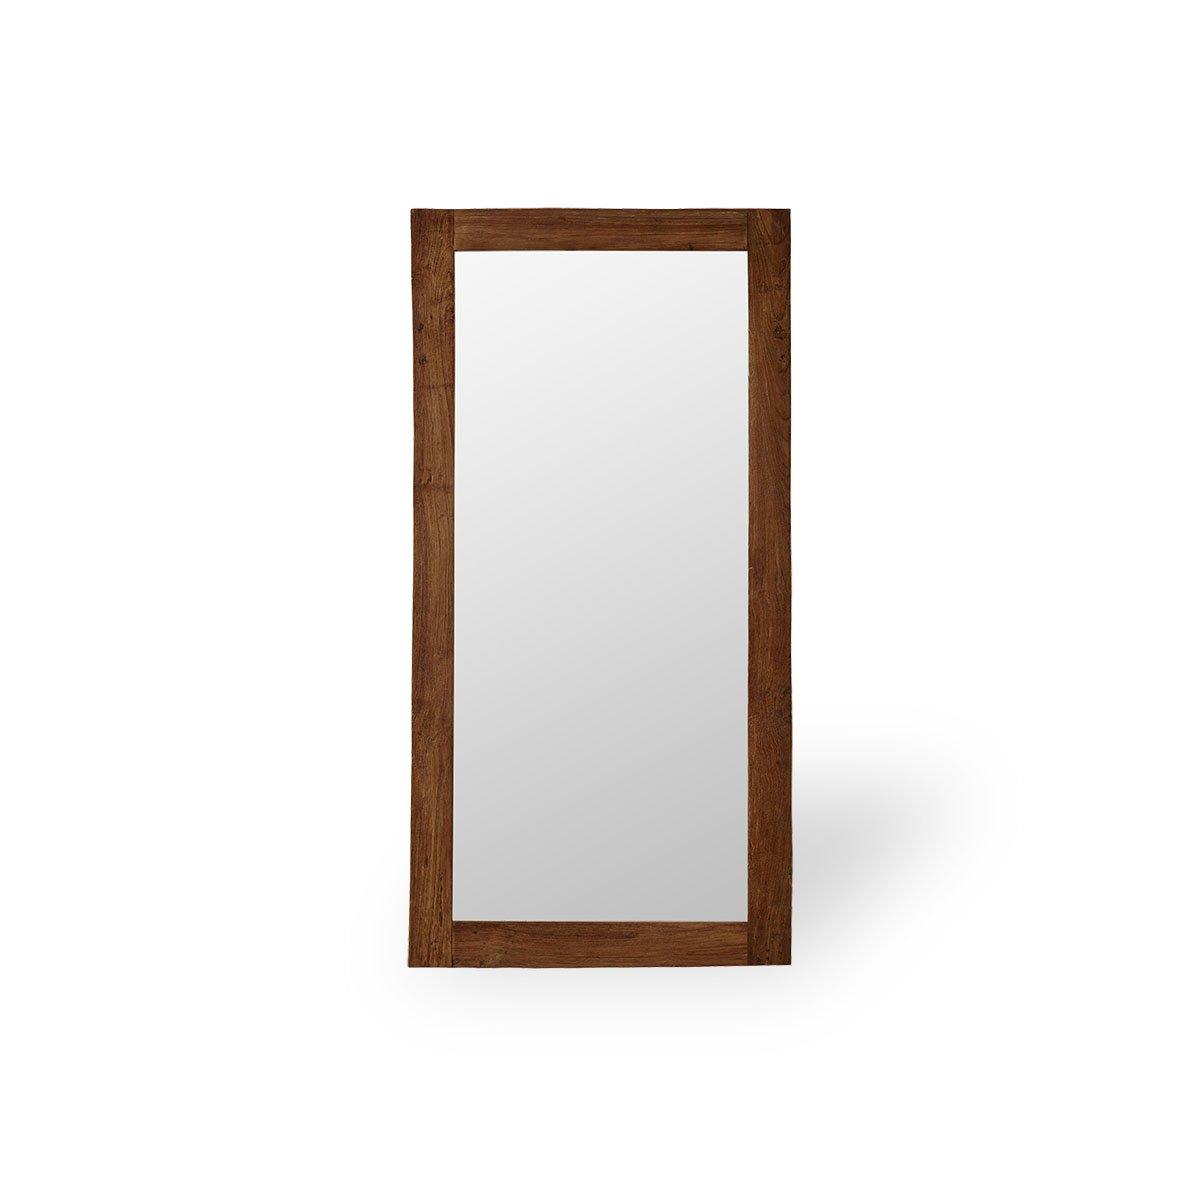 Sika Design Spiegel Lucas 180x90 cm Teak